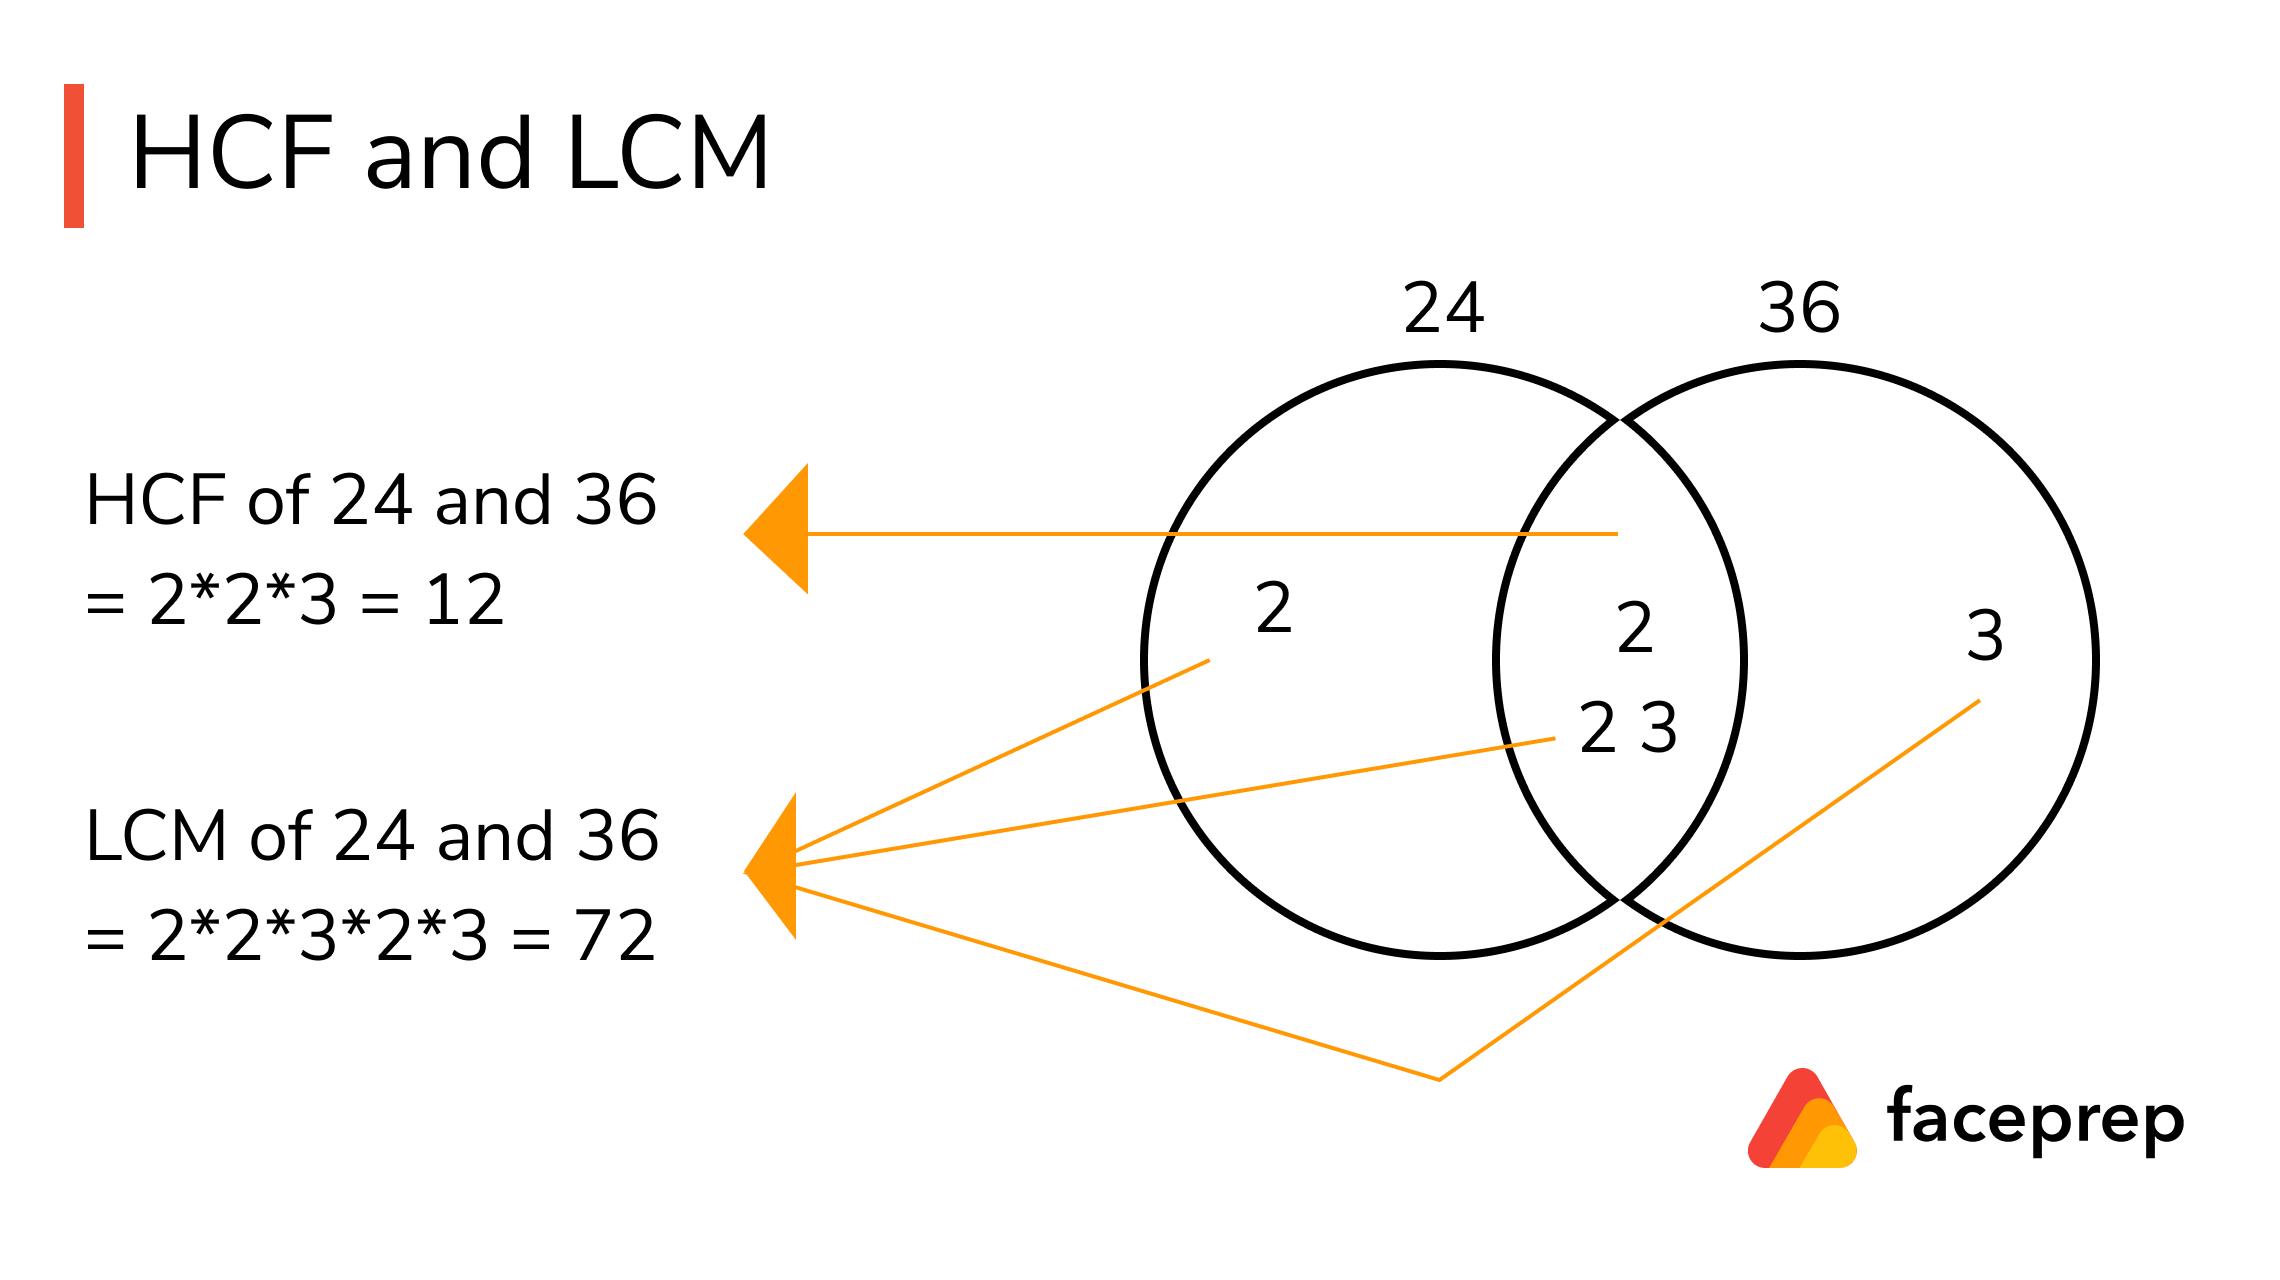 hcf and lcm methods